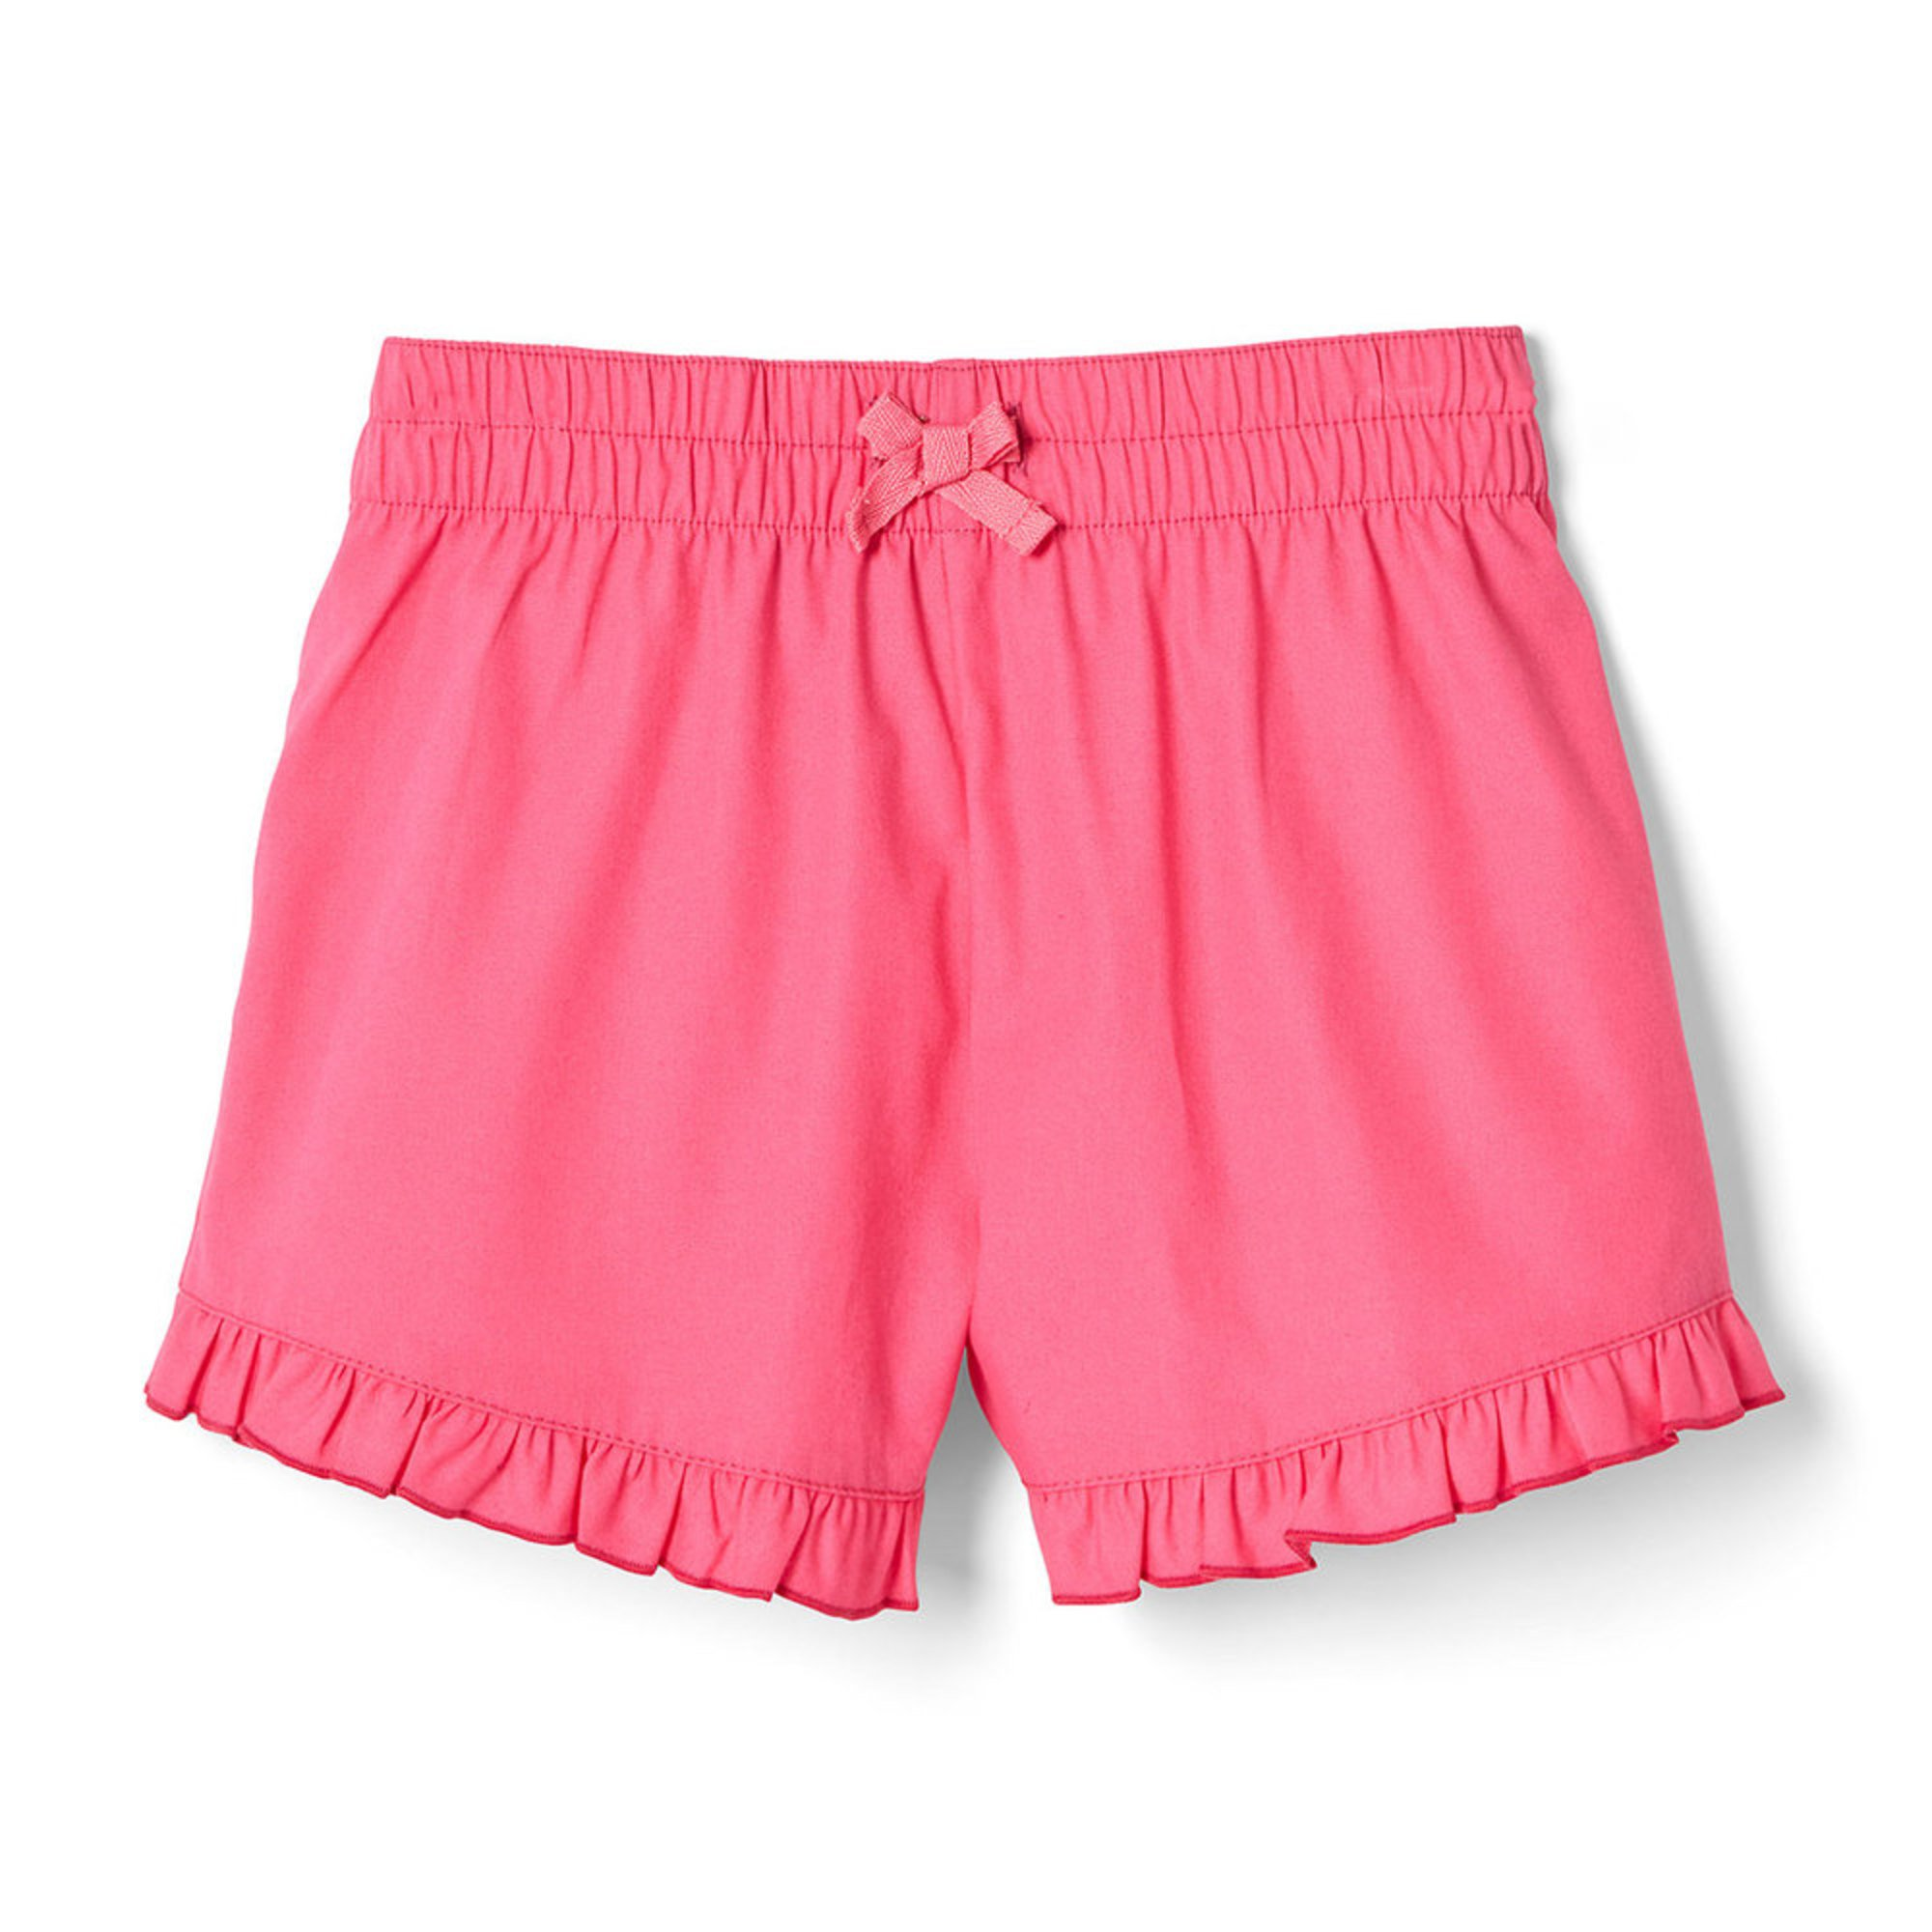 Yarn & Sea Big Girls' Ruffle Woven Shorts | Big Girls